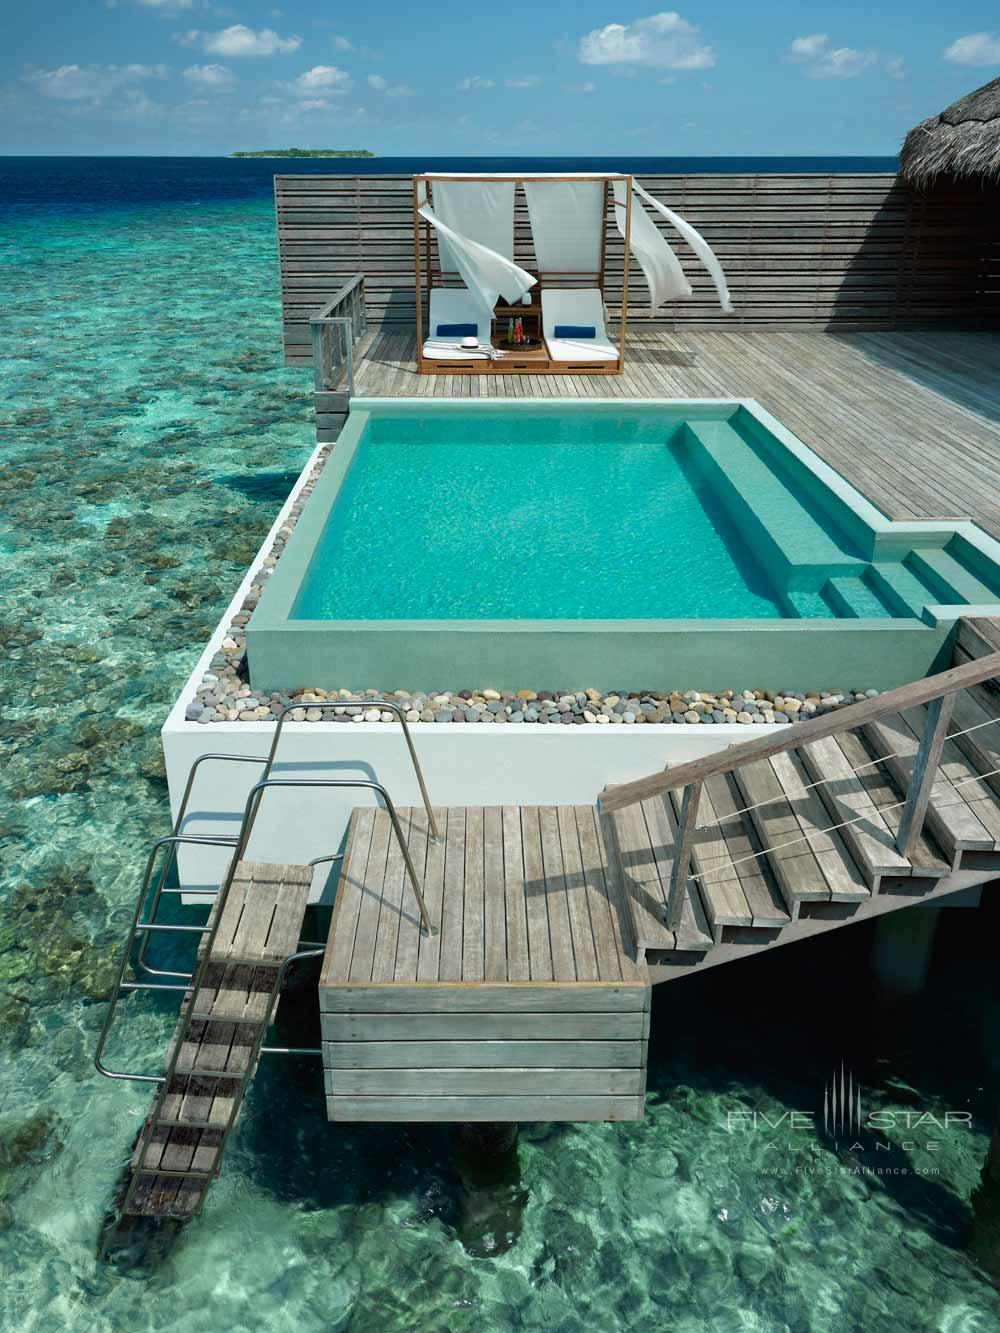 Ocean Villa Plunge Pool by the Sea at Dusit Thani Maldives